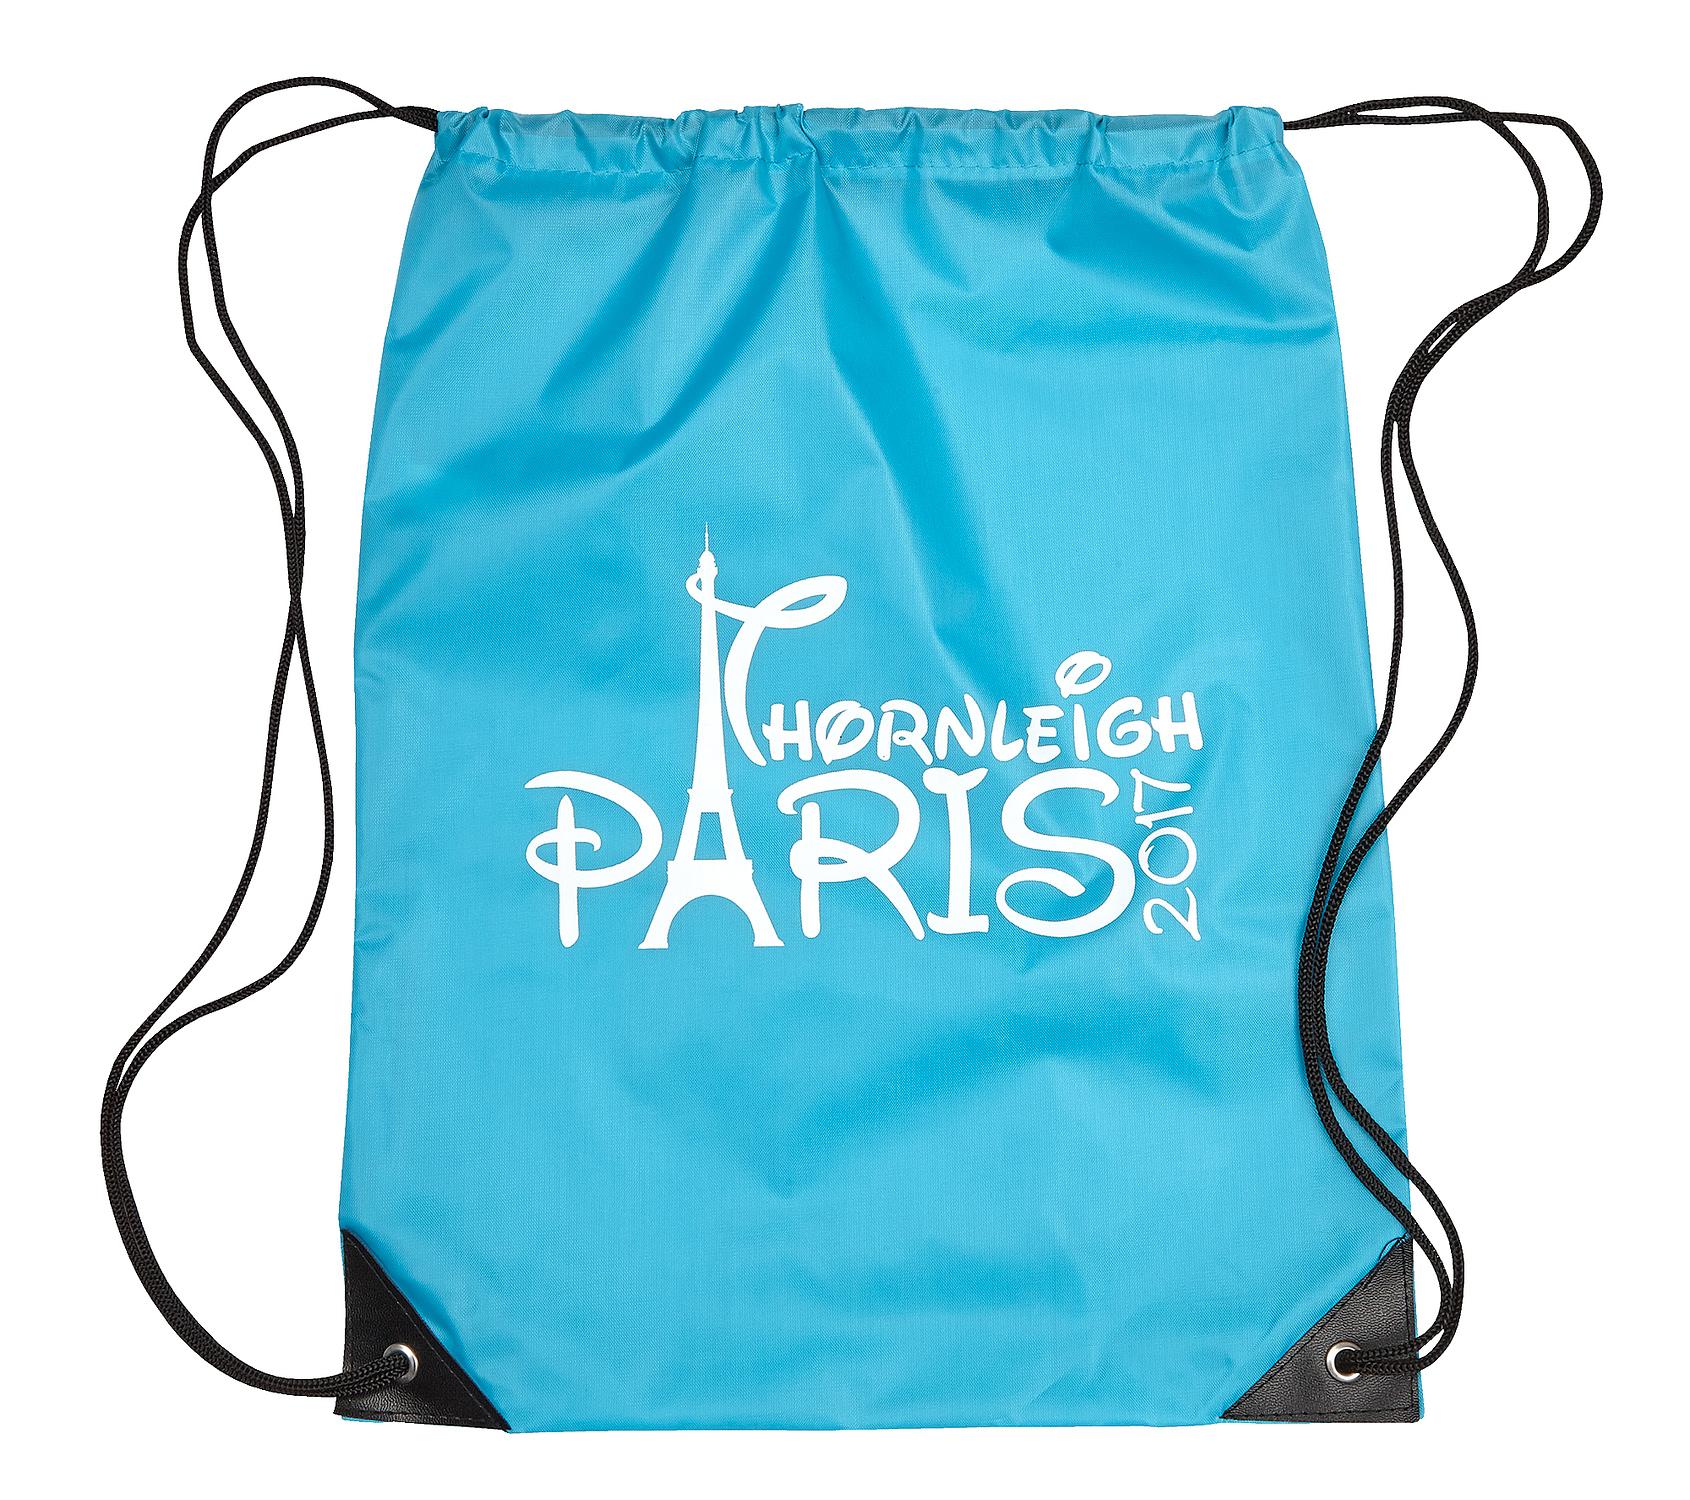 Thornleigh Paris Custom Bag